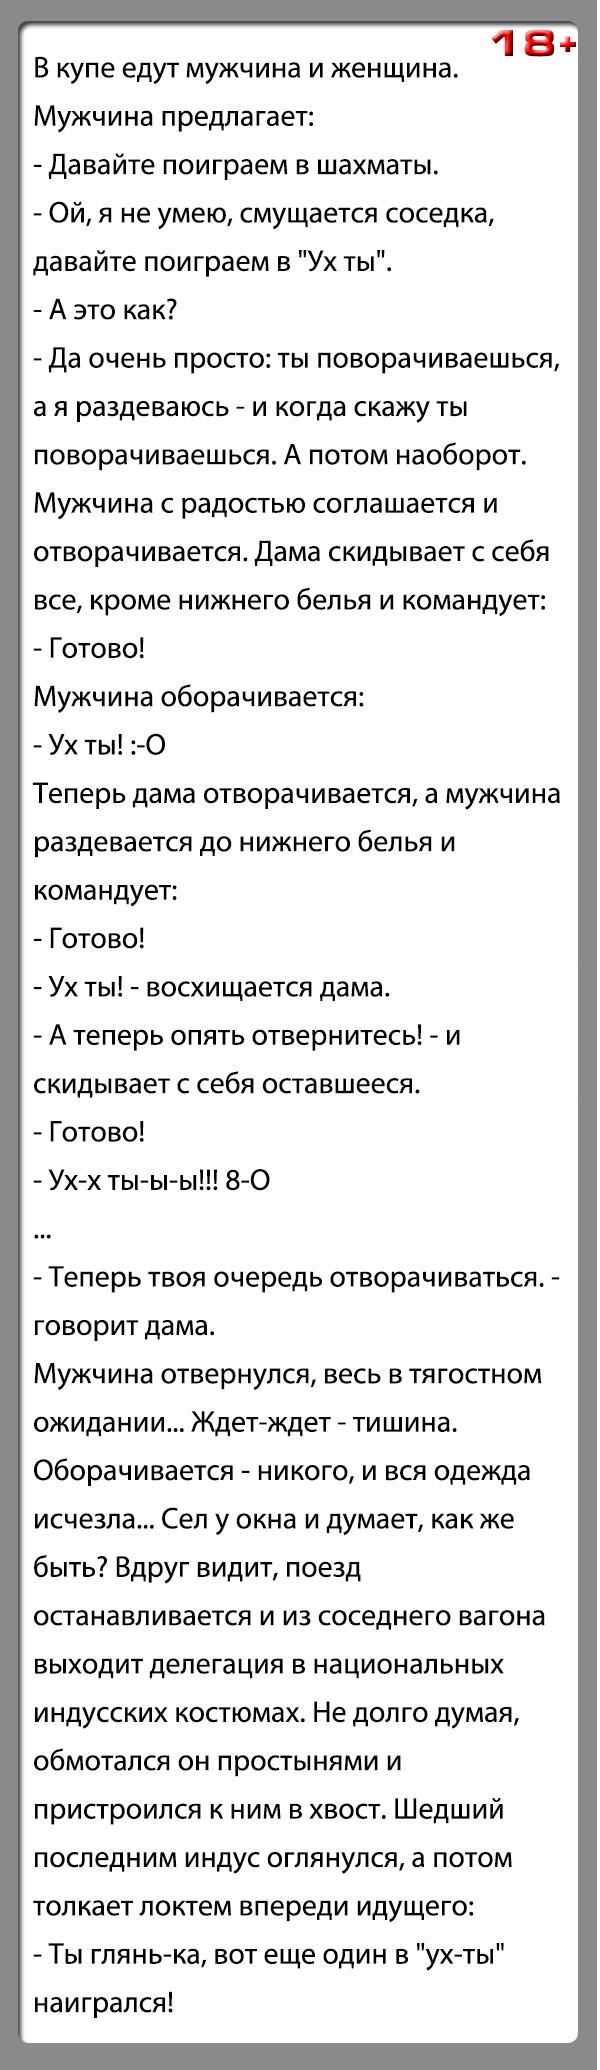 Анекдот Ух ты